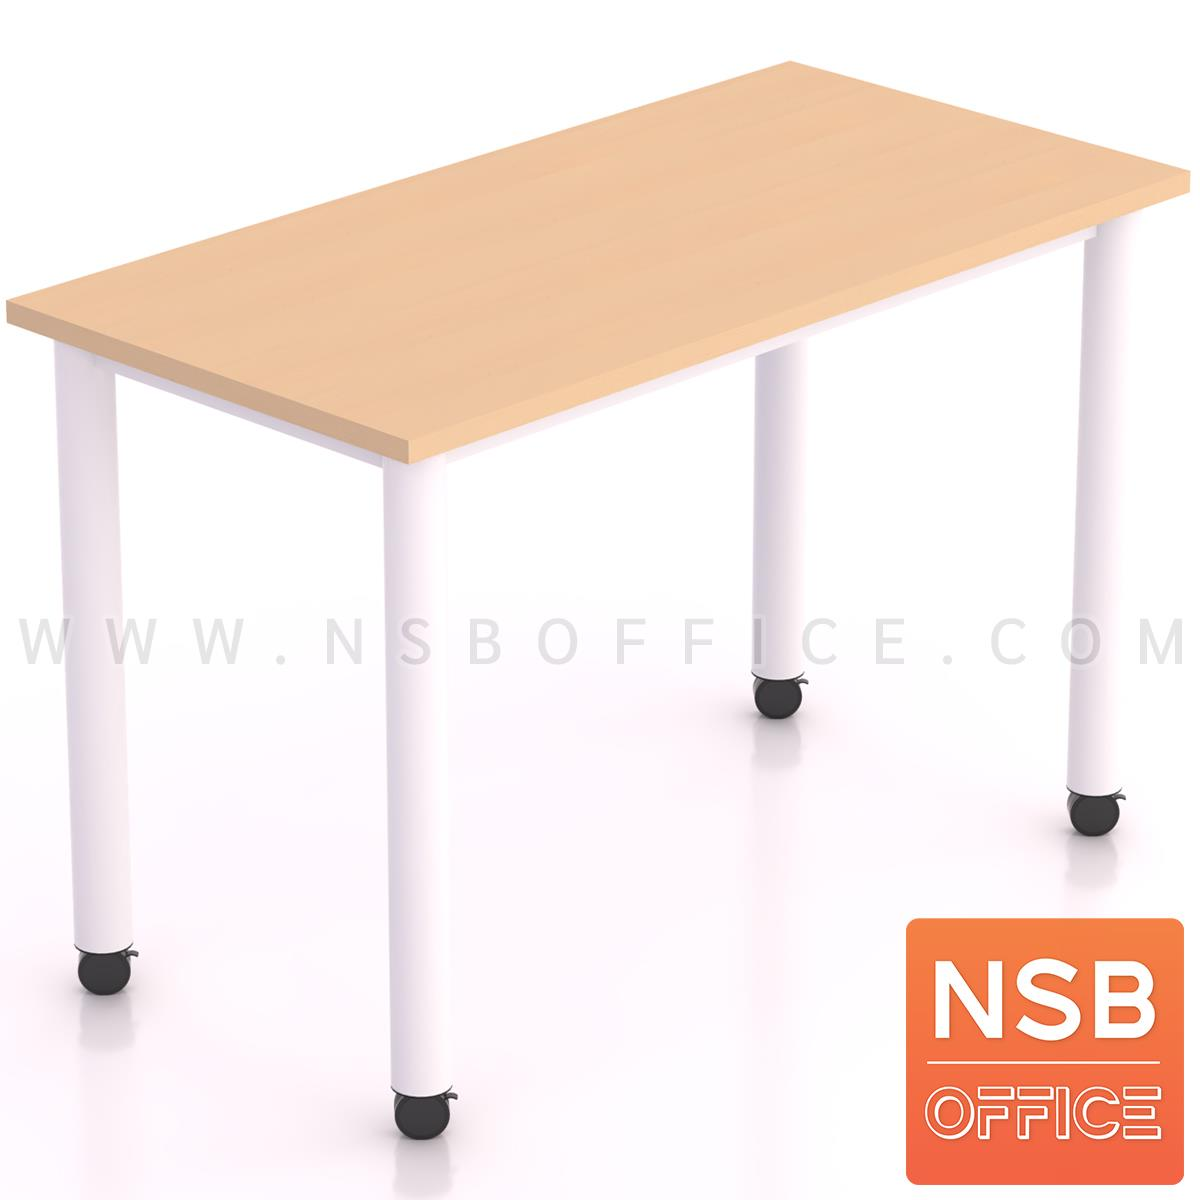 B30A063:โต๊ะทำงานทรงสี่เหลี่ยม  รุ่น Malvern (มัลเวิร์น)  โครงขากลม สีขาว